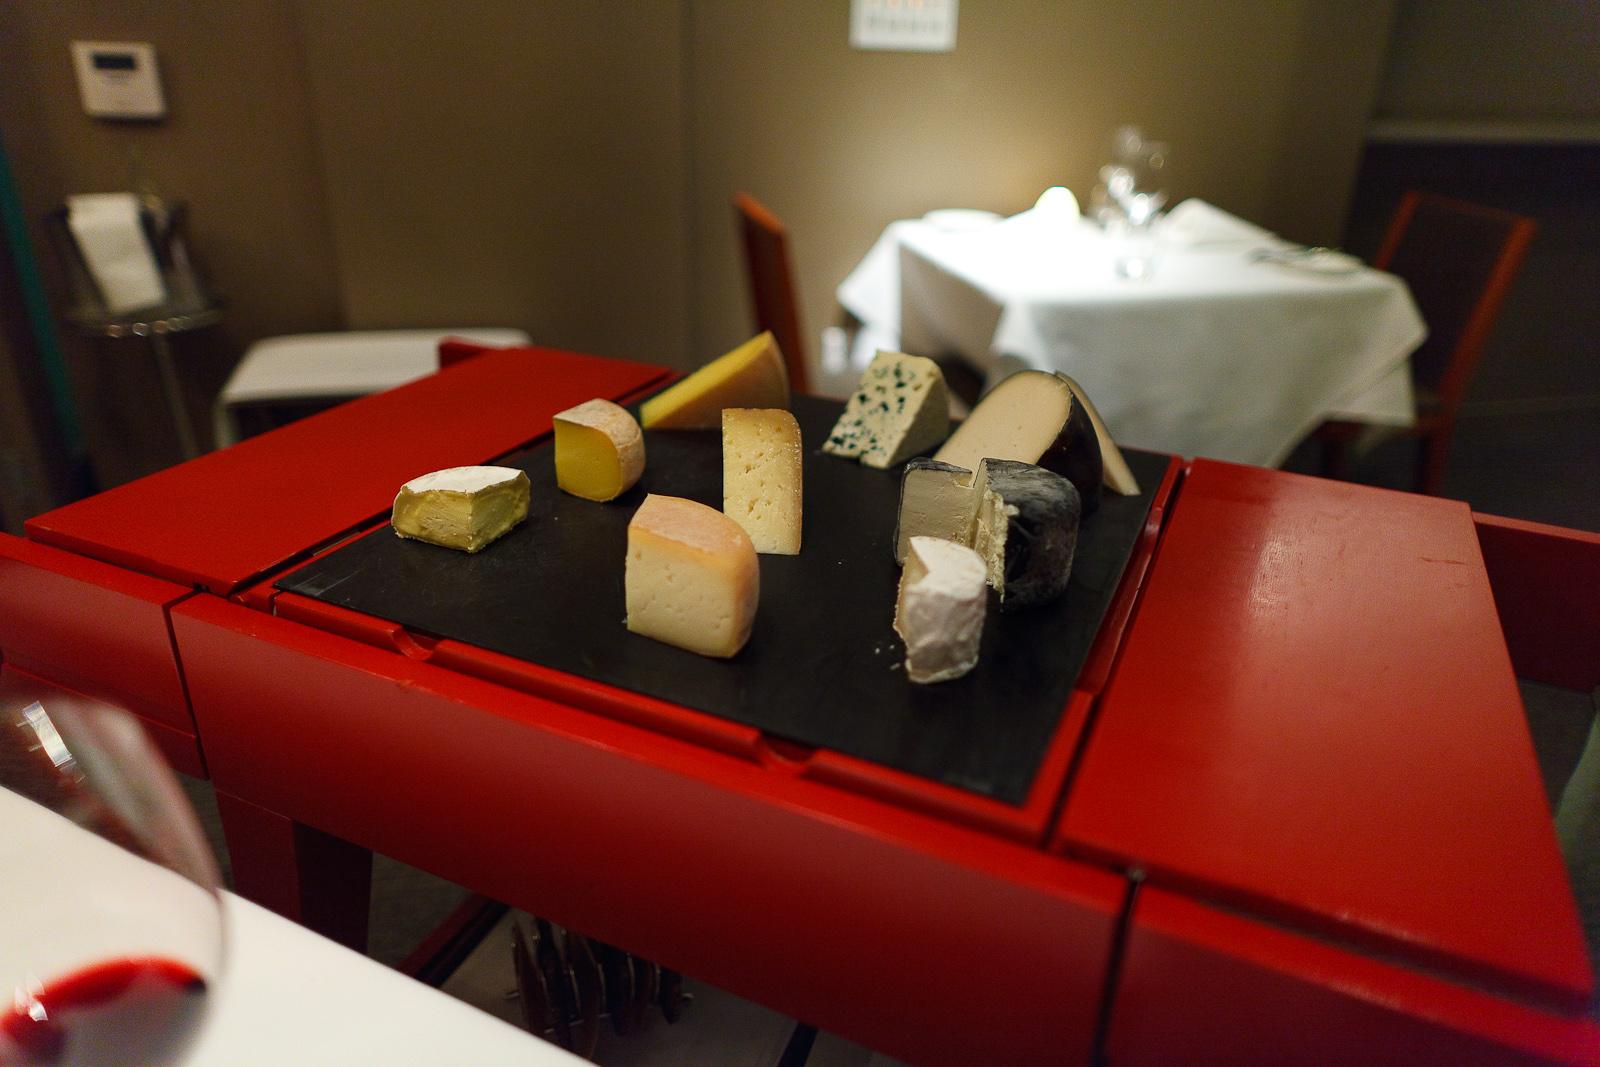 Cheese course: Bent river, Blond d'Espèce, Pleasant Ridge reserve, Amarello de beta spacious, Garden Variety's Moonflower